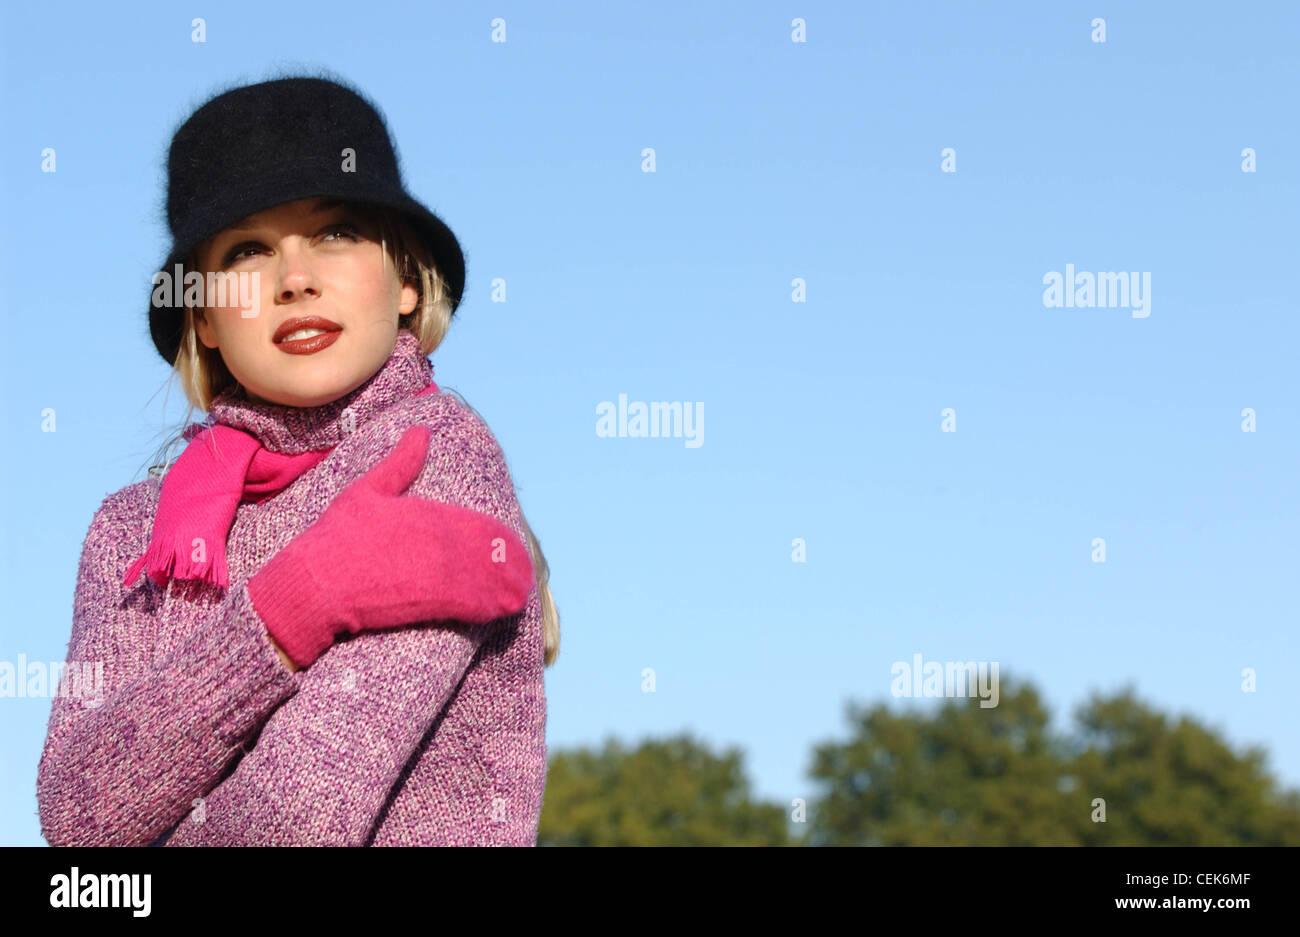 Female long blonde hair brown tones of make up wearing black angora hat purple roll neck jumper bright pink scarf - Stock Image